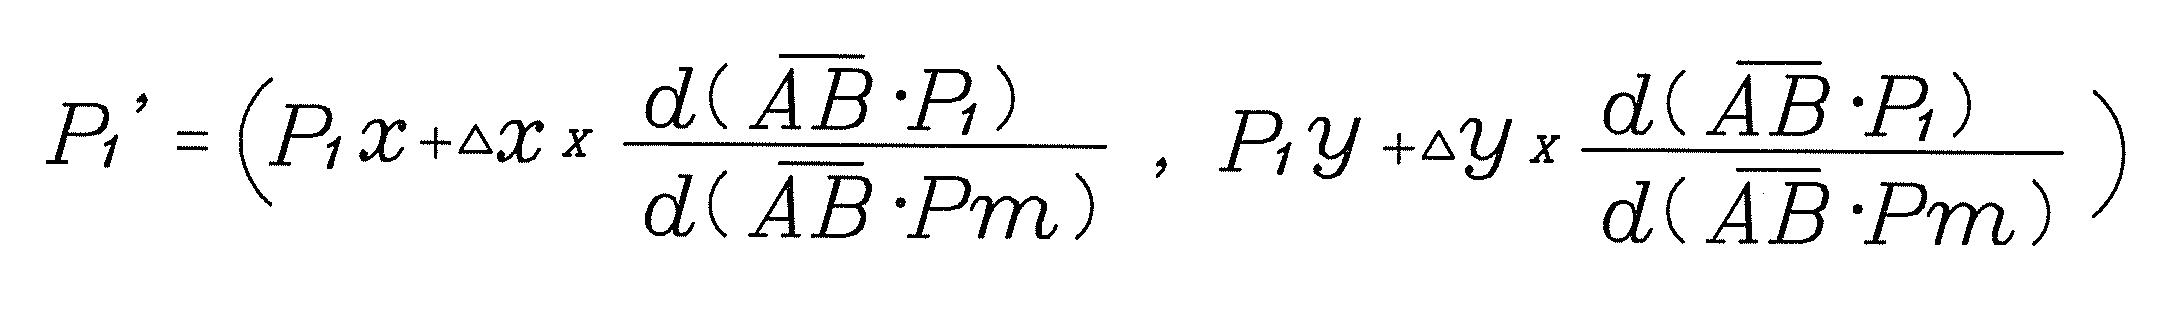 Figure 112011032804328-pat00010